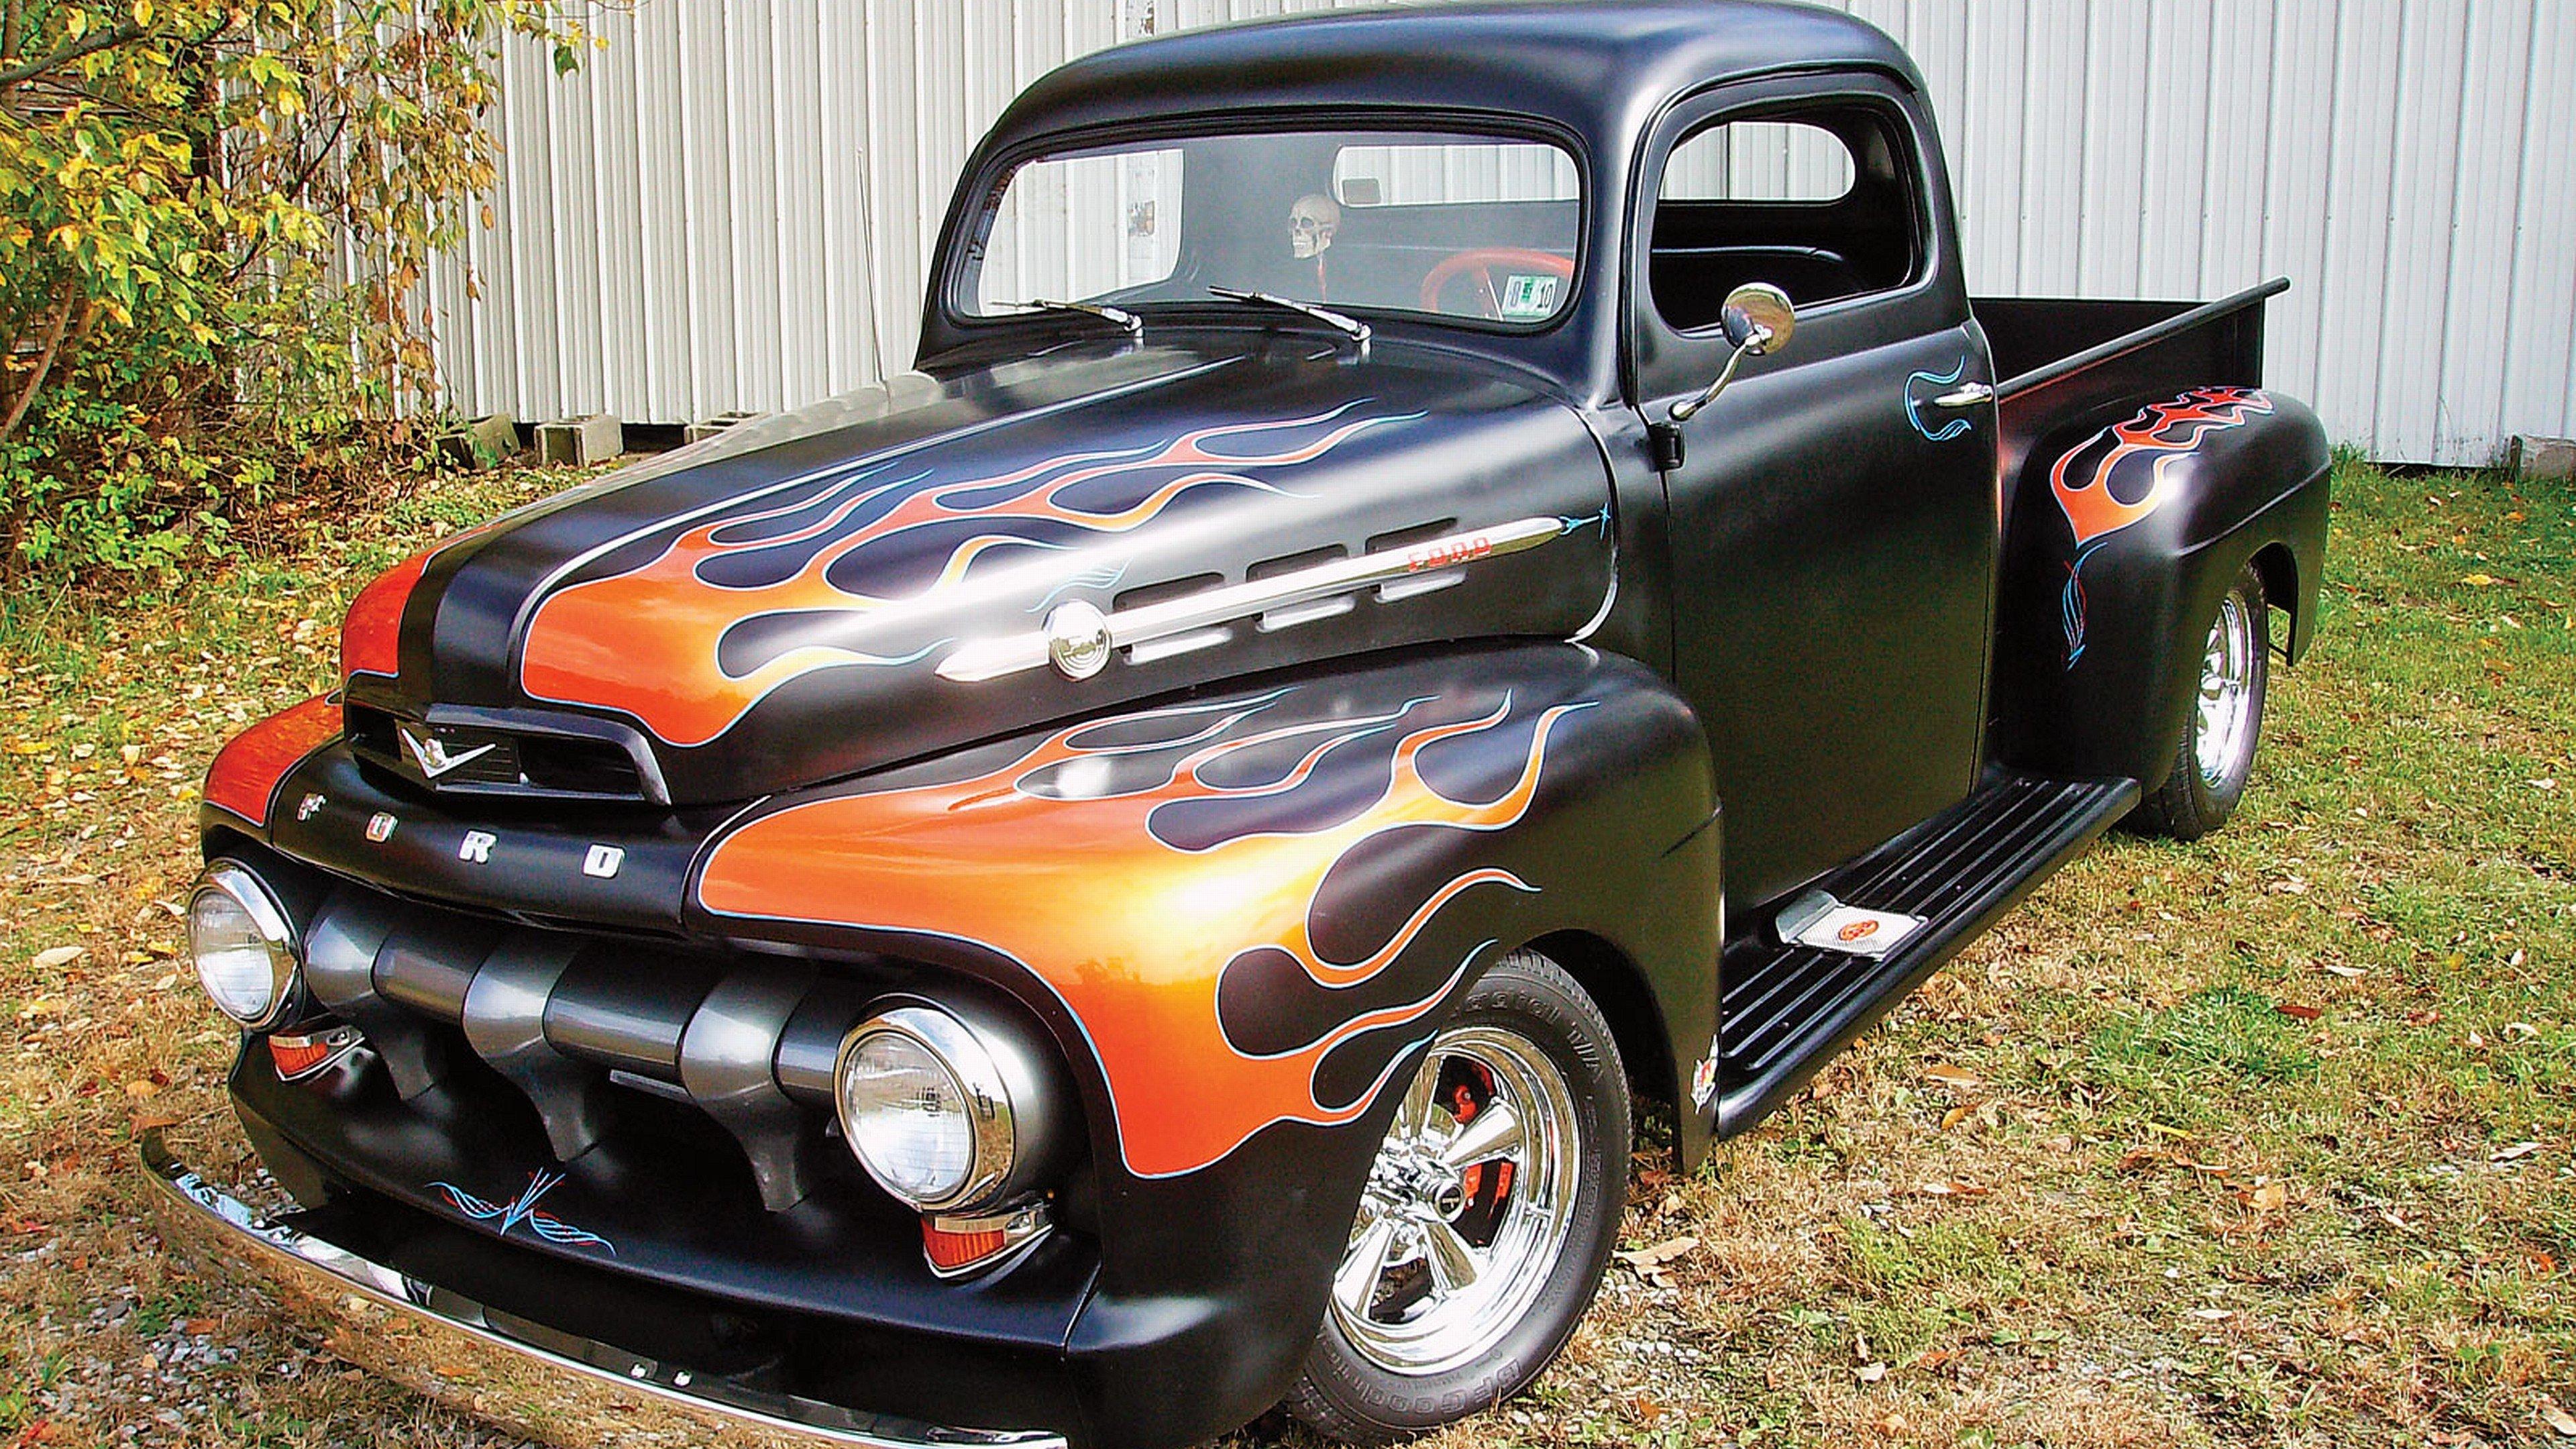 Flames Hot Rod Ford trucks Classic vehicles wallpaper | 3840x2160 ...